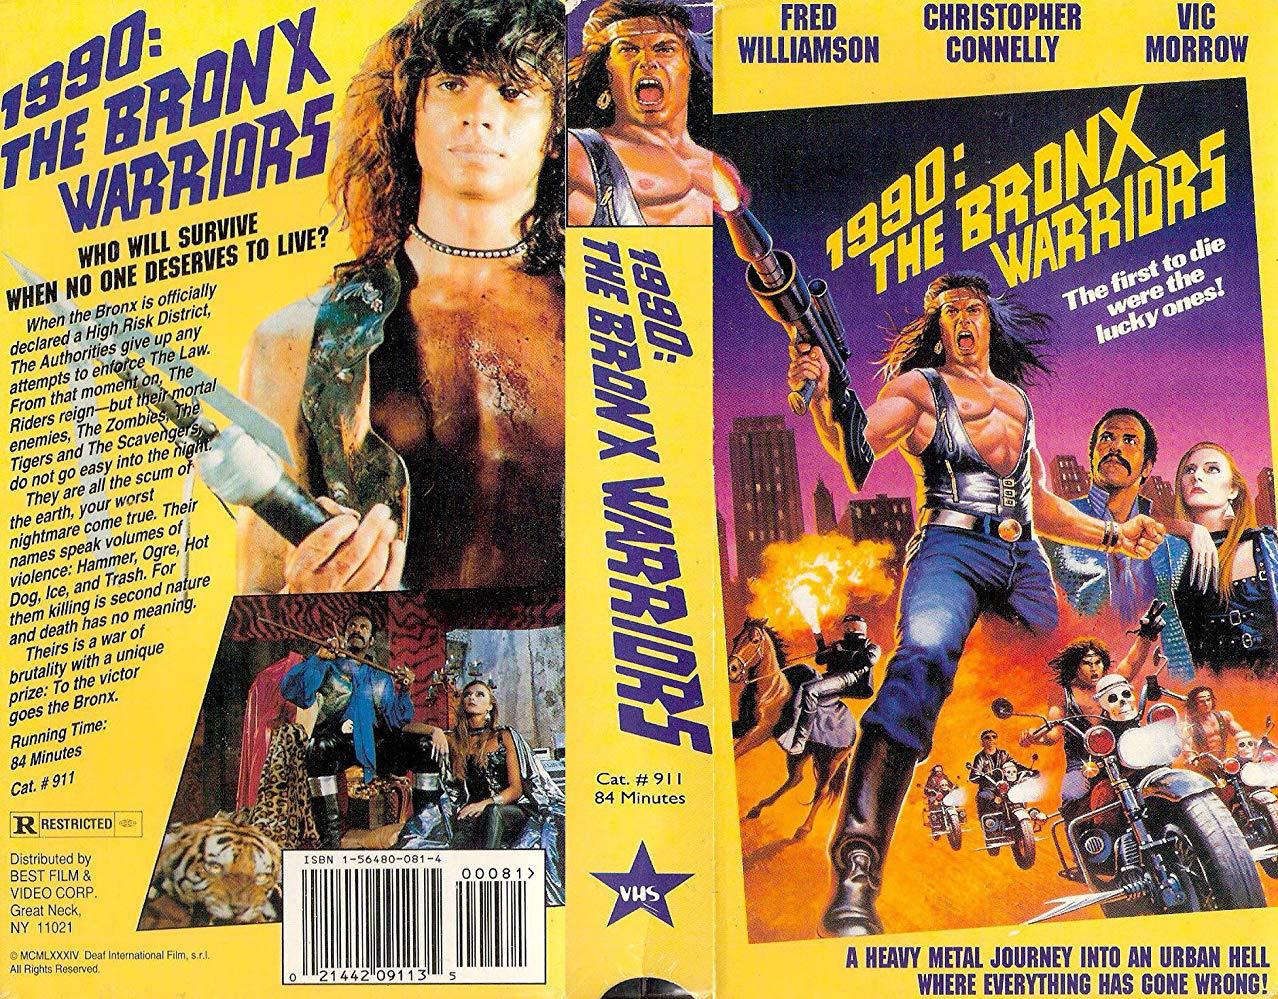 1990 VHS